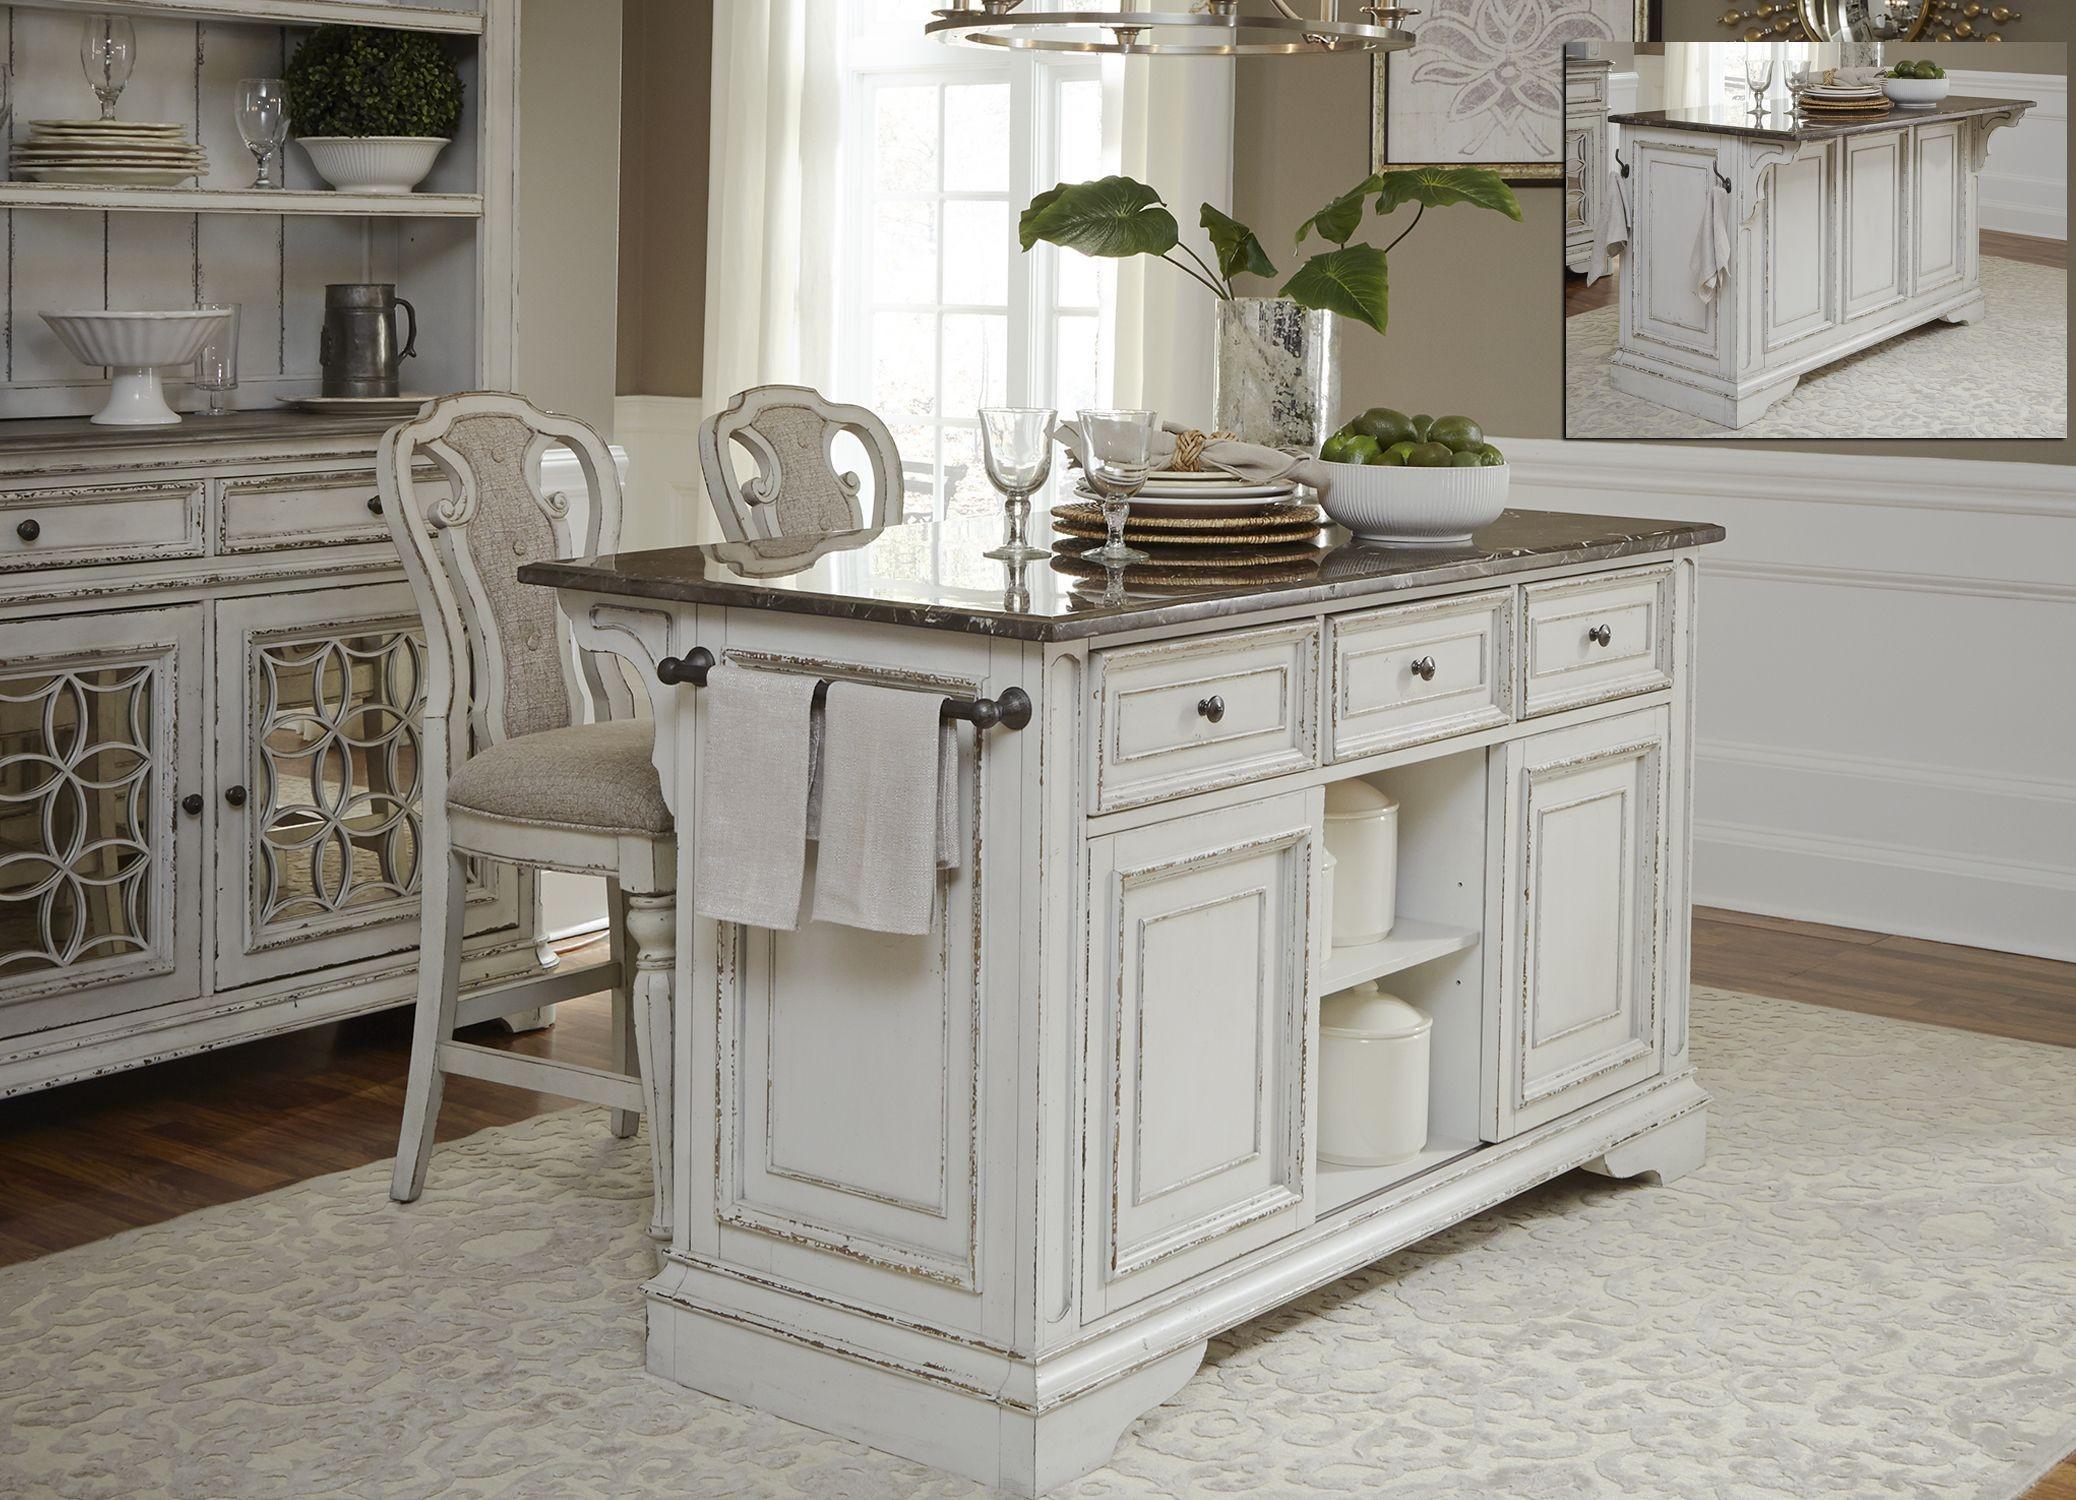 Magnolia Manor Antique White Kitchen Island Set from